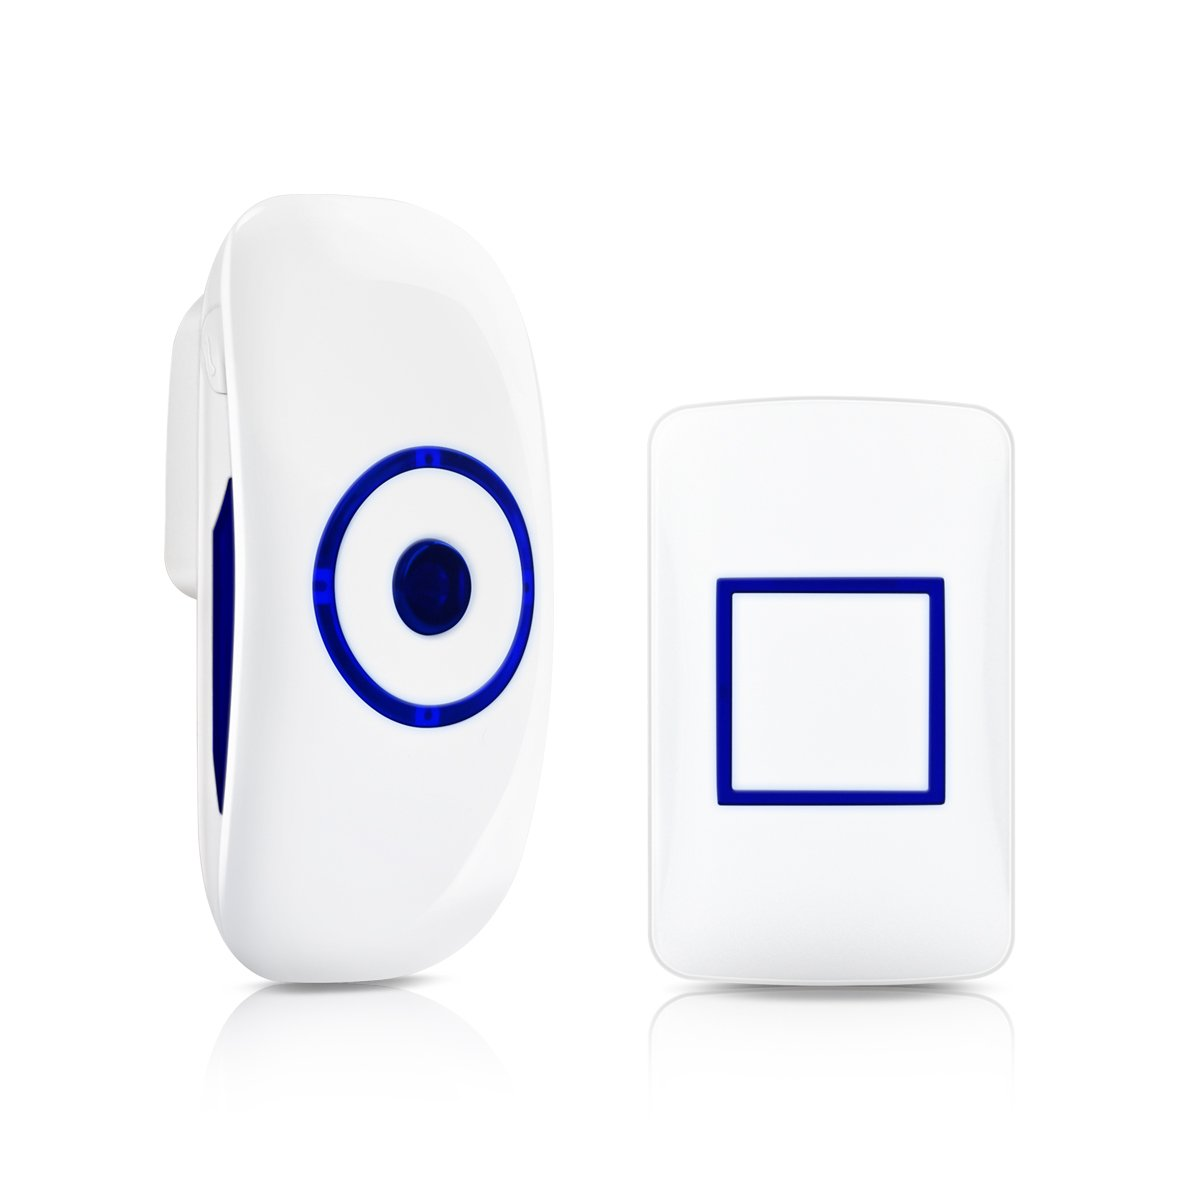 Antart Wireless Doorbell Waterproof Door Bell Kit, 1000 Feet Operating, 36 Chimes, 4 Level Volume, LED Indicator, 1 Plug-In Receiver 1 Push Button Transmitter